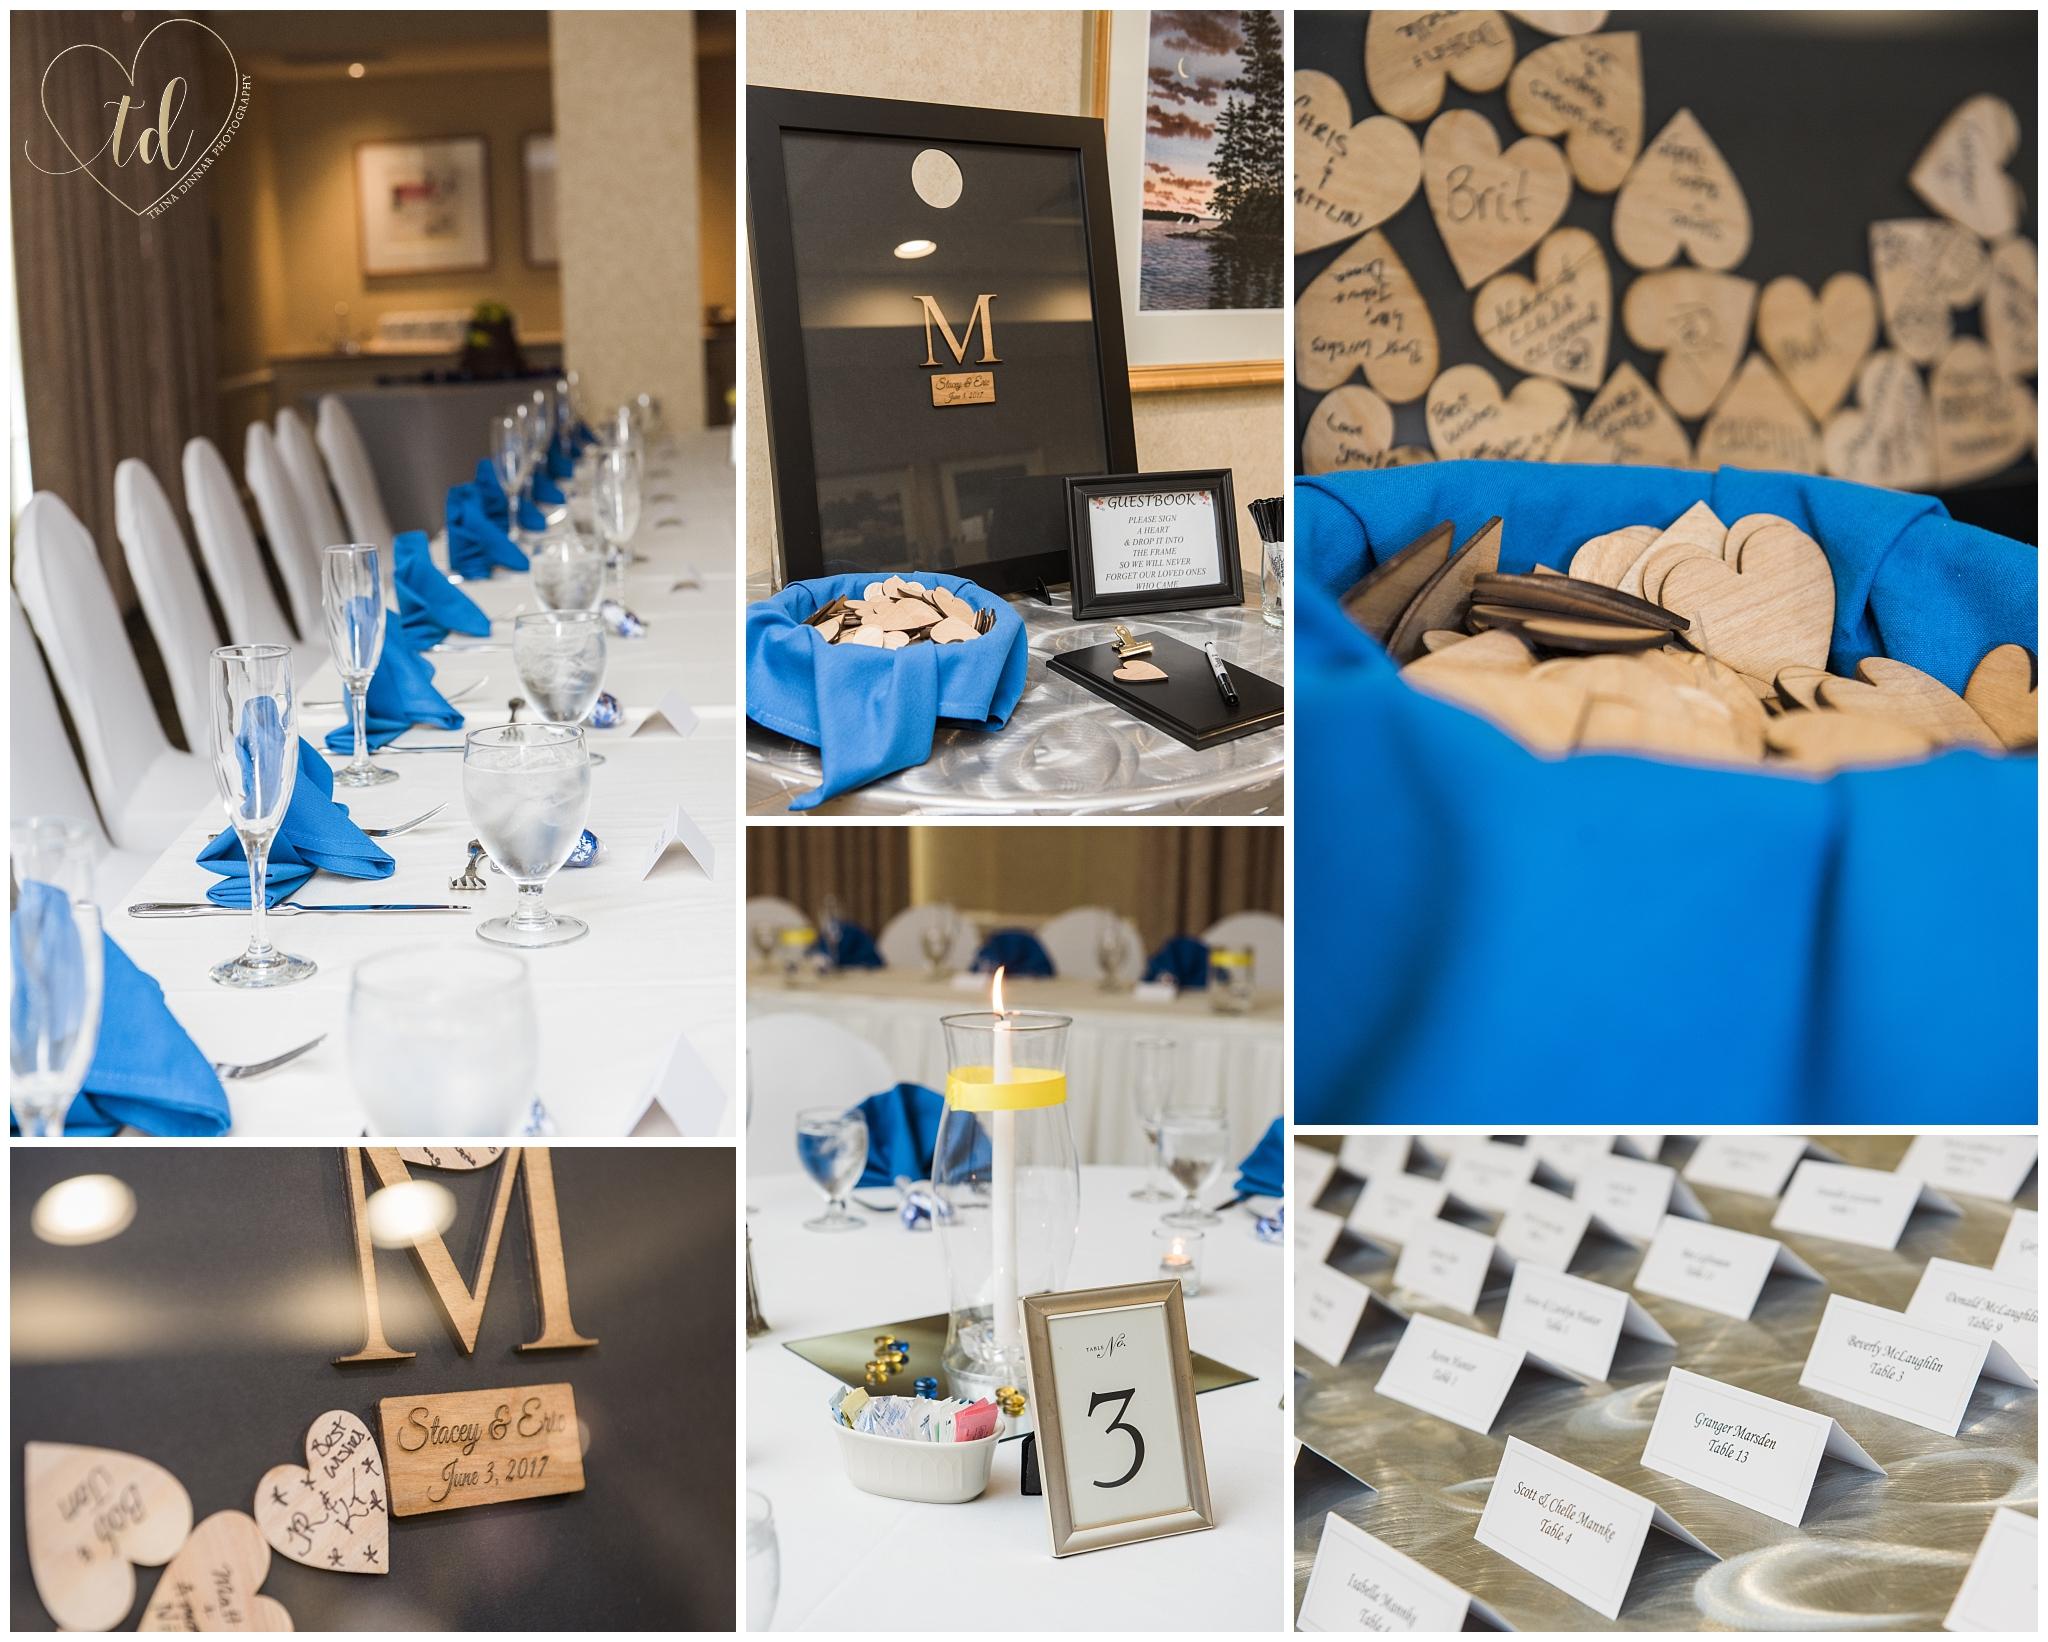 Wedding Reception details at the Hilton Garden Inn in Freeport, ME.